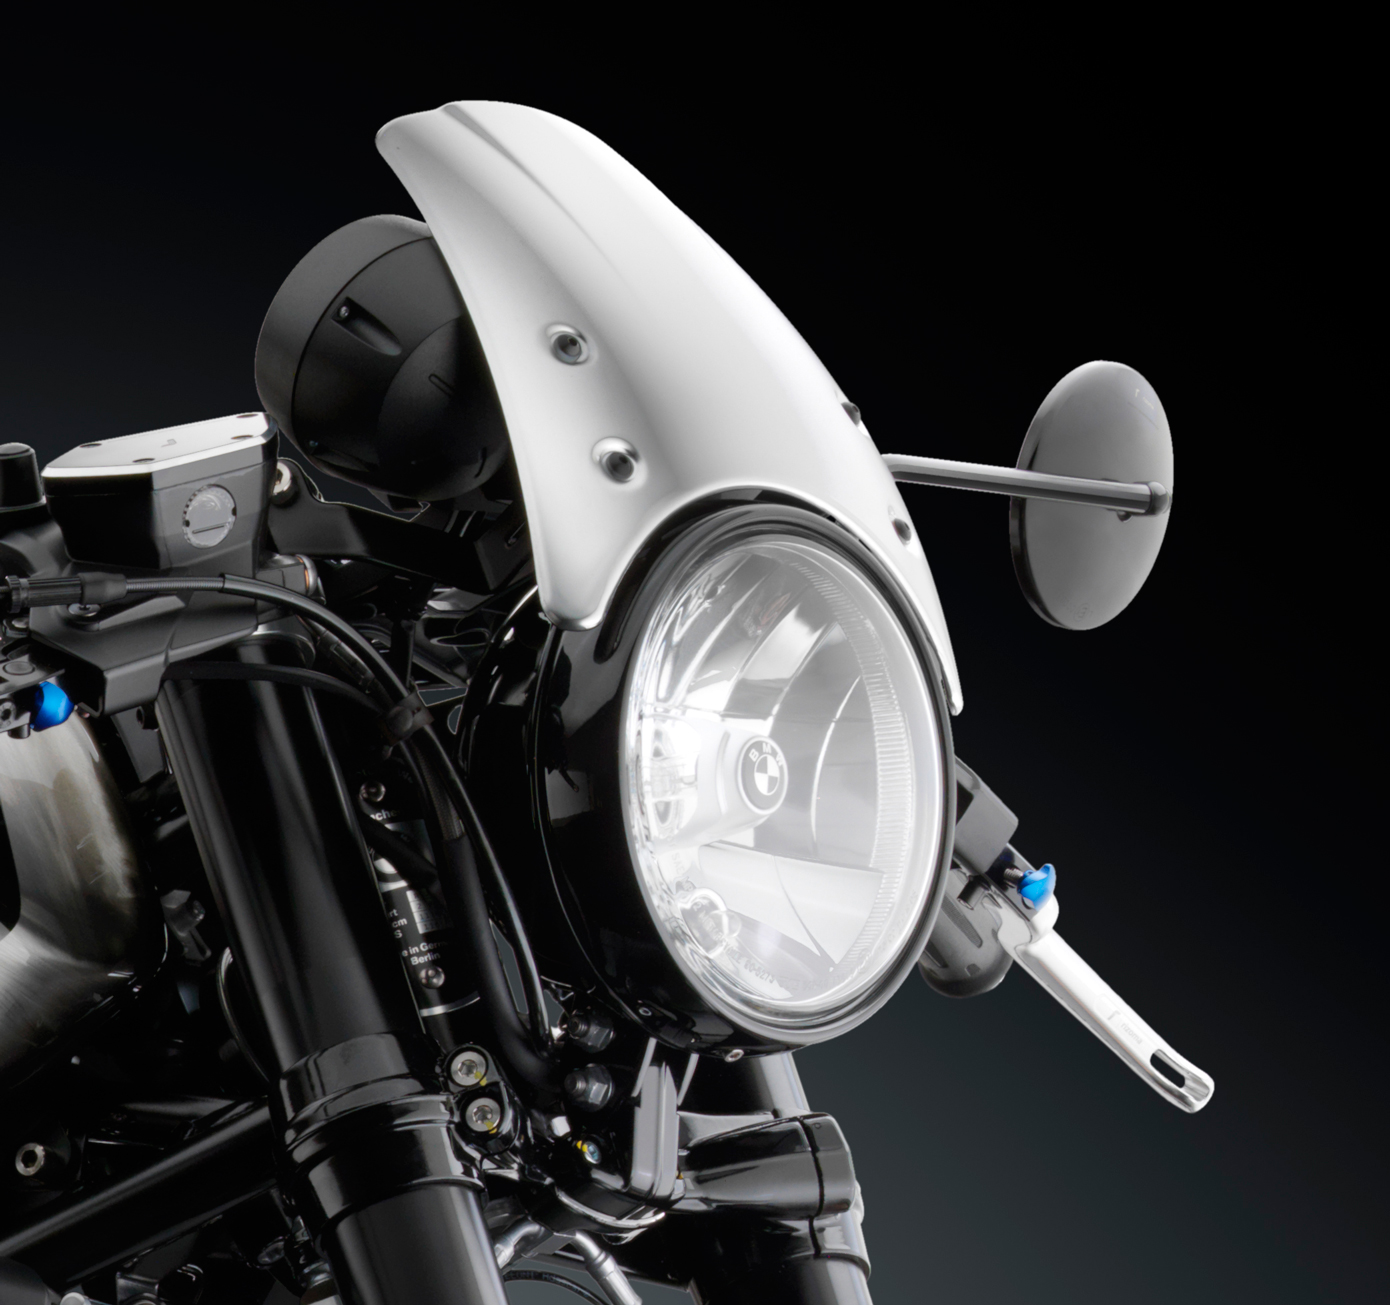 Rizoma Aluminum High Headlight Fairing w/ Mounting